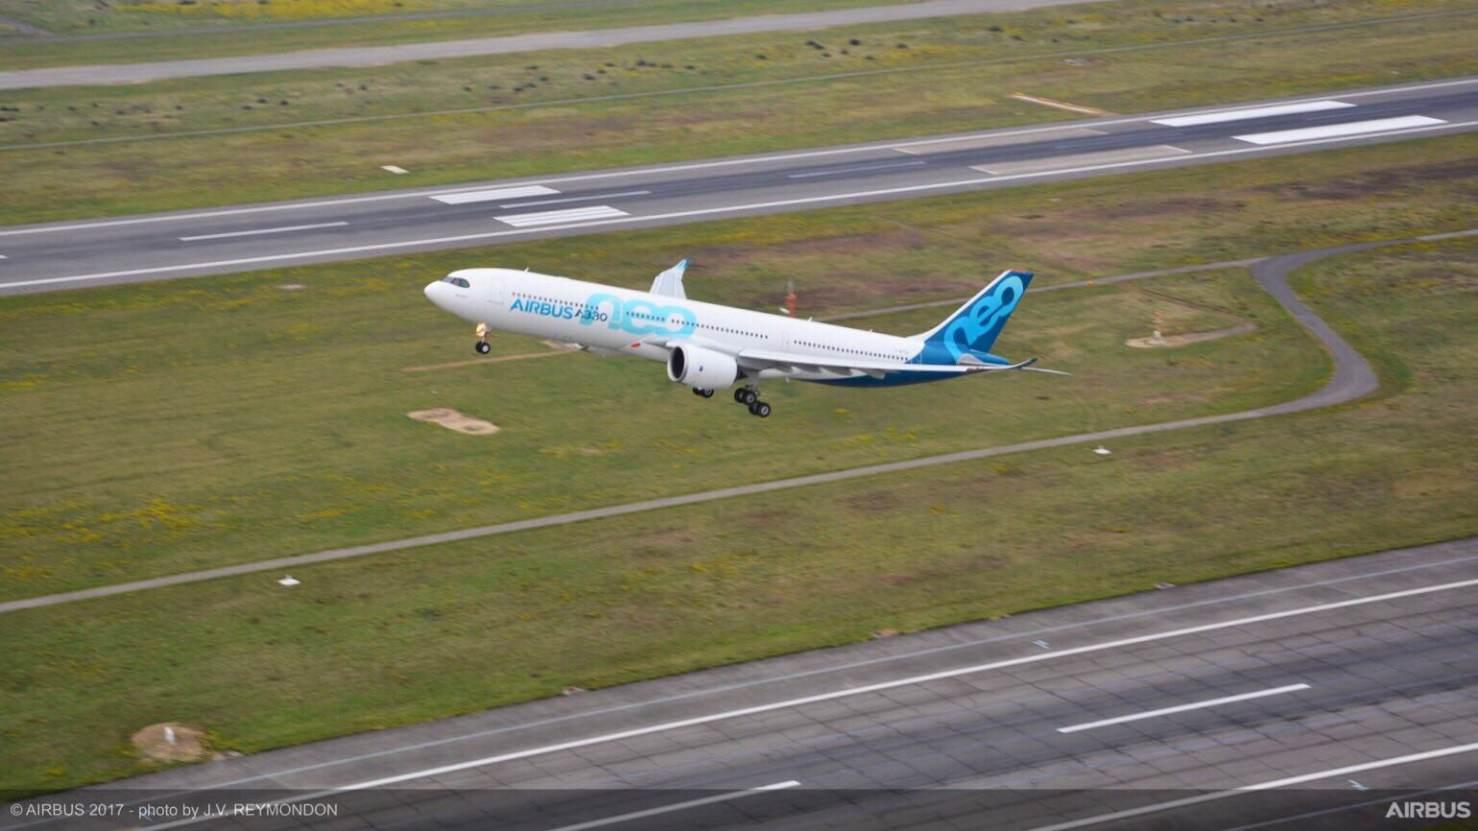 A330neo makes first flight